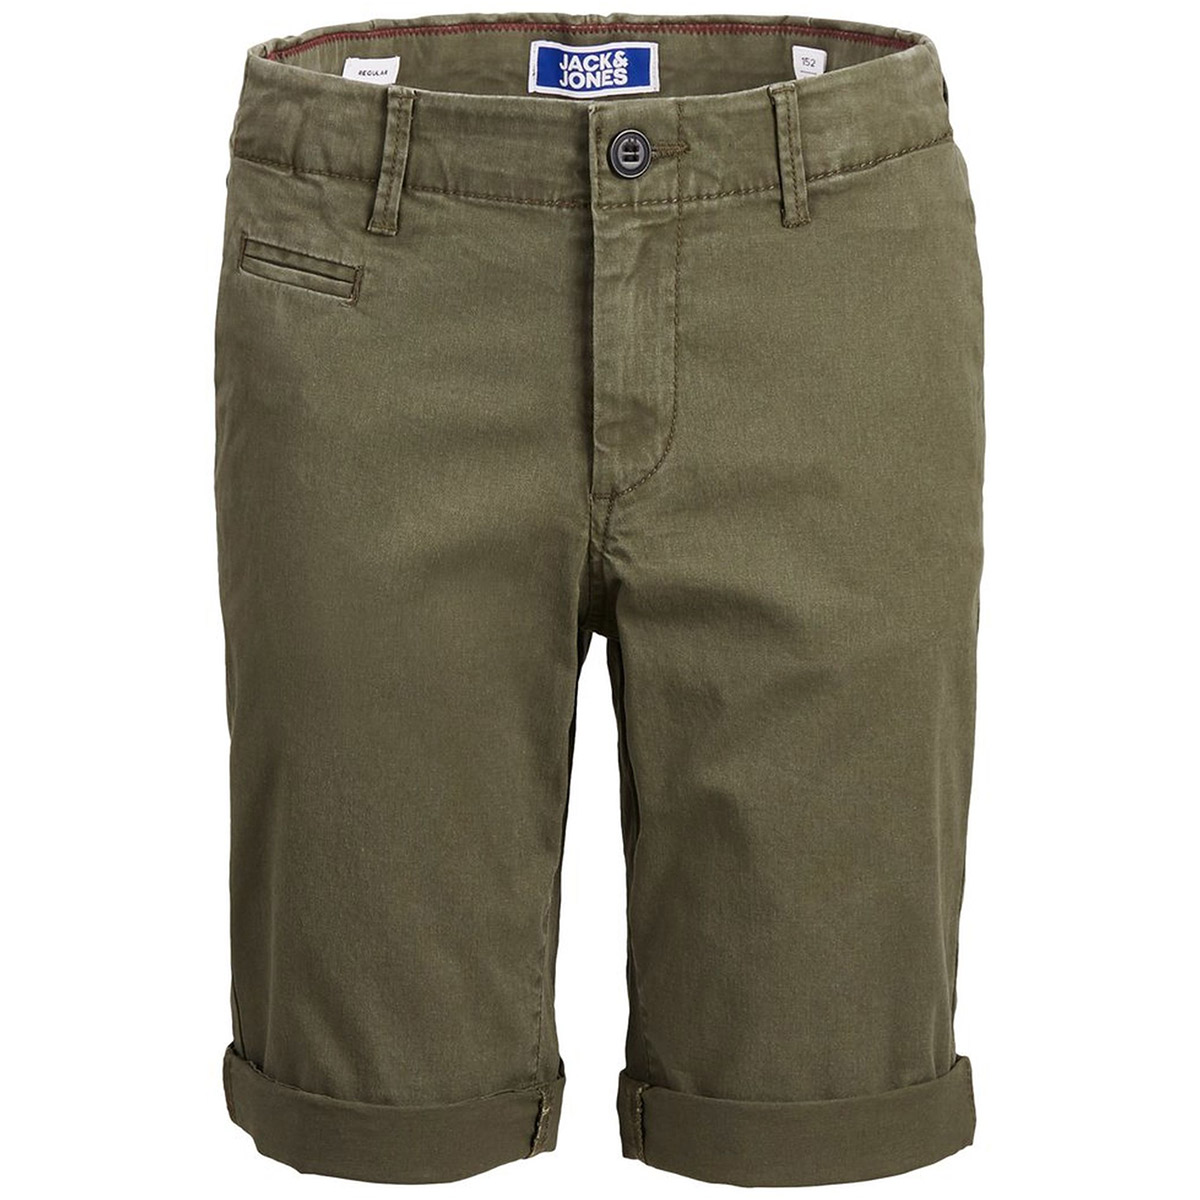 b113ce5a34c Kinder shorts & bermuda's online outlet